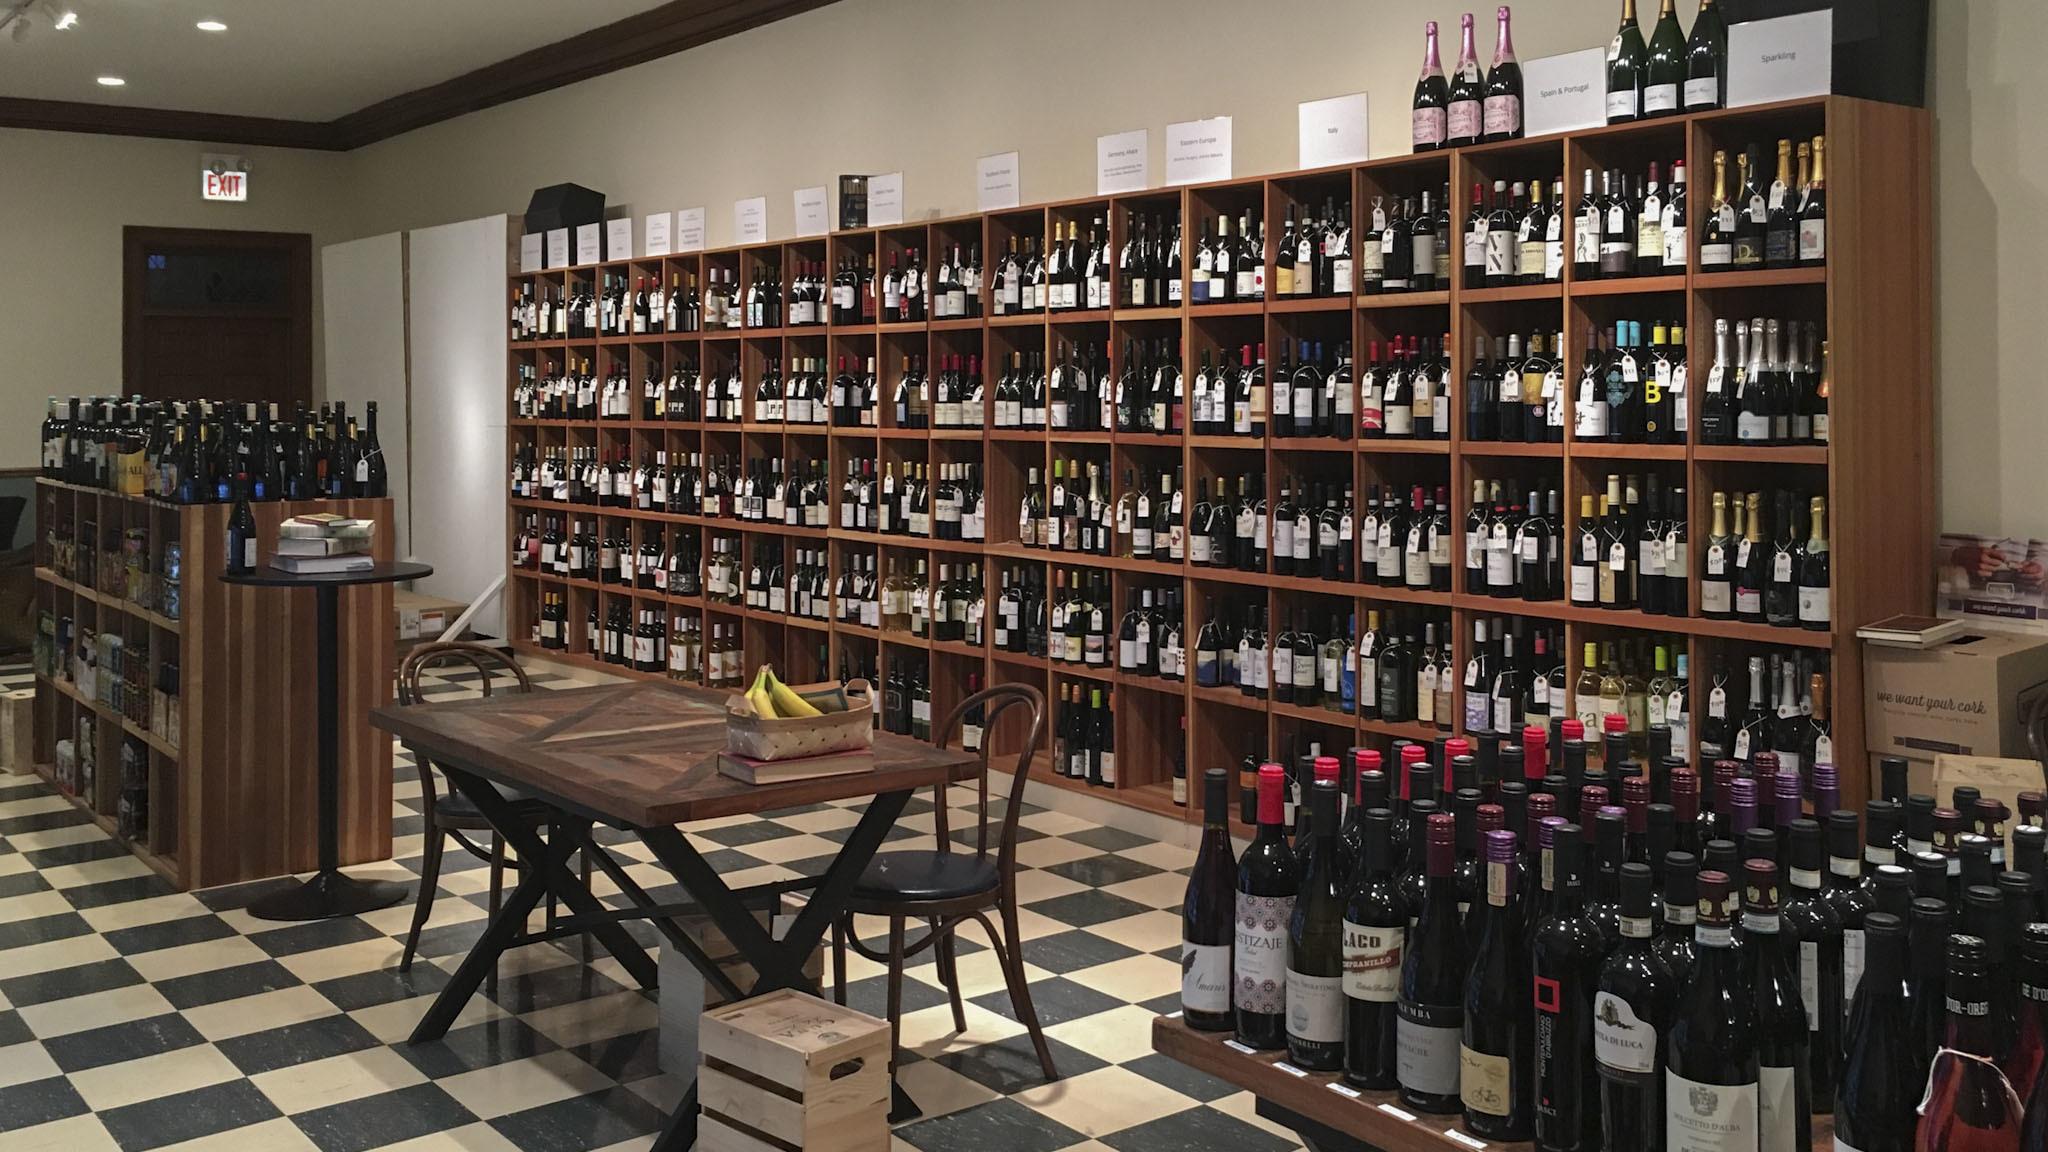 57th Street Wines